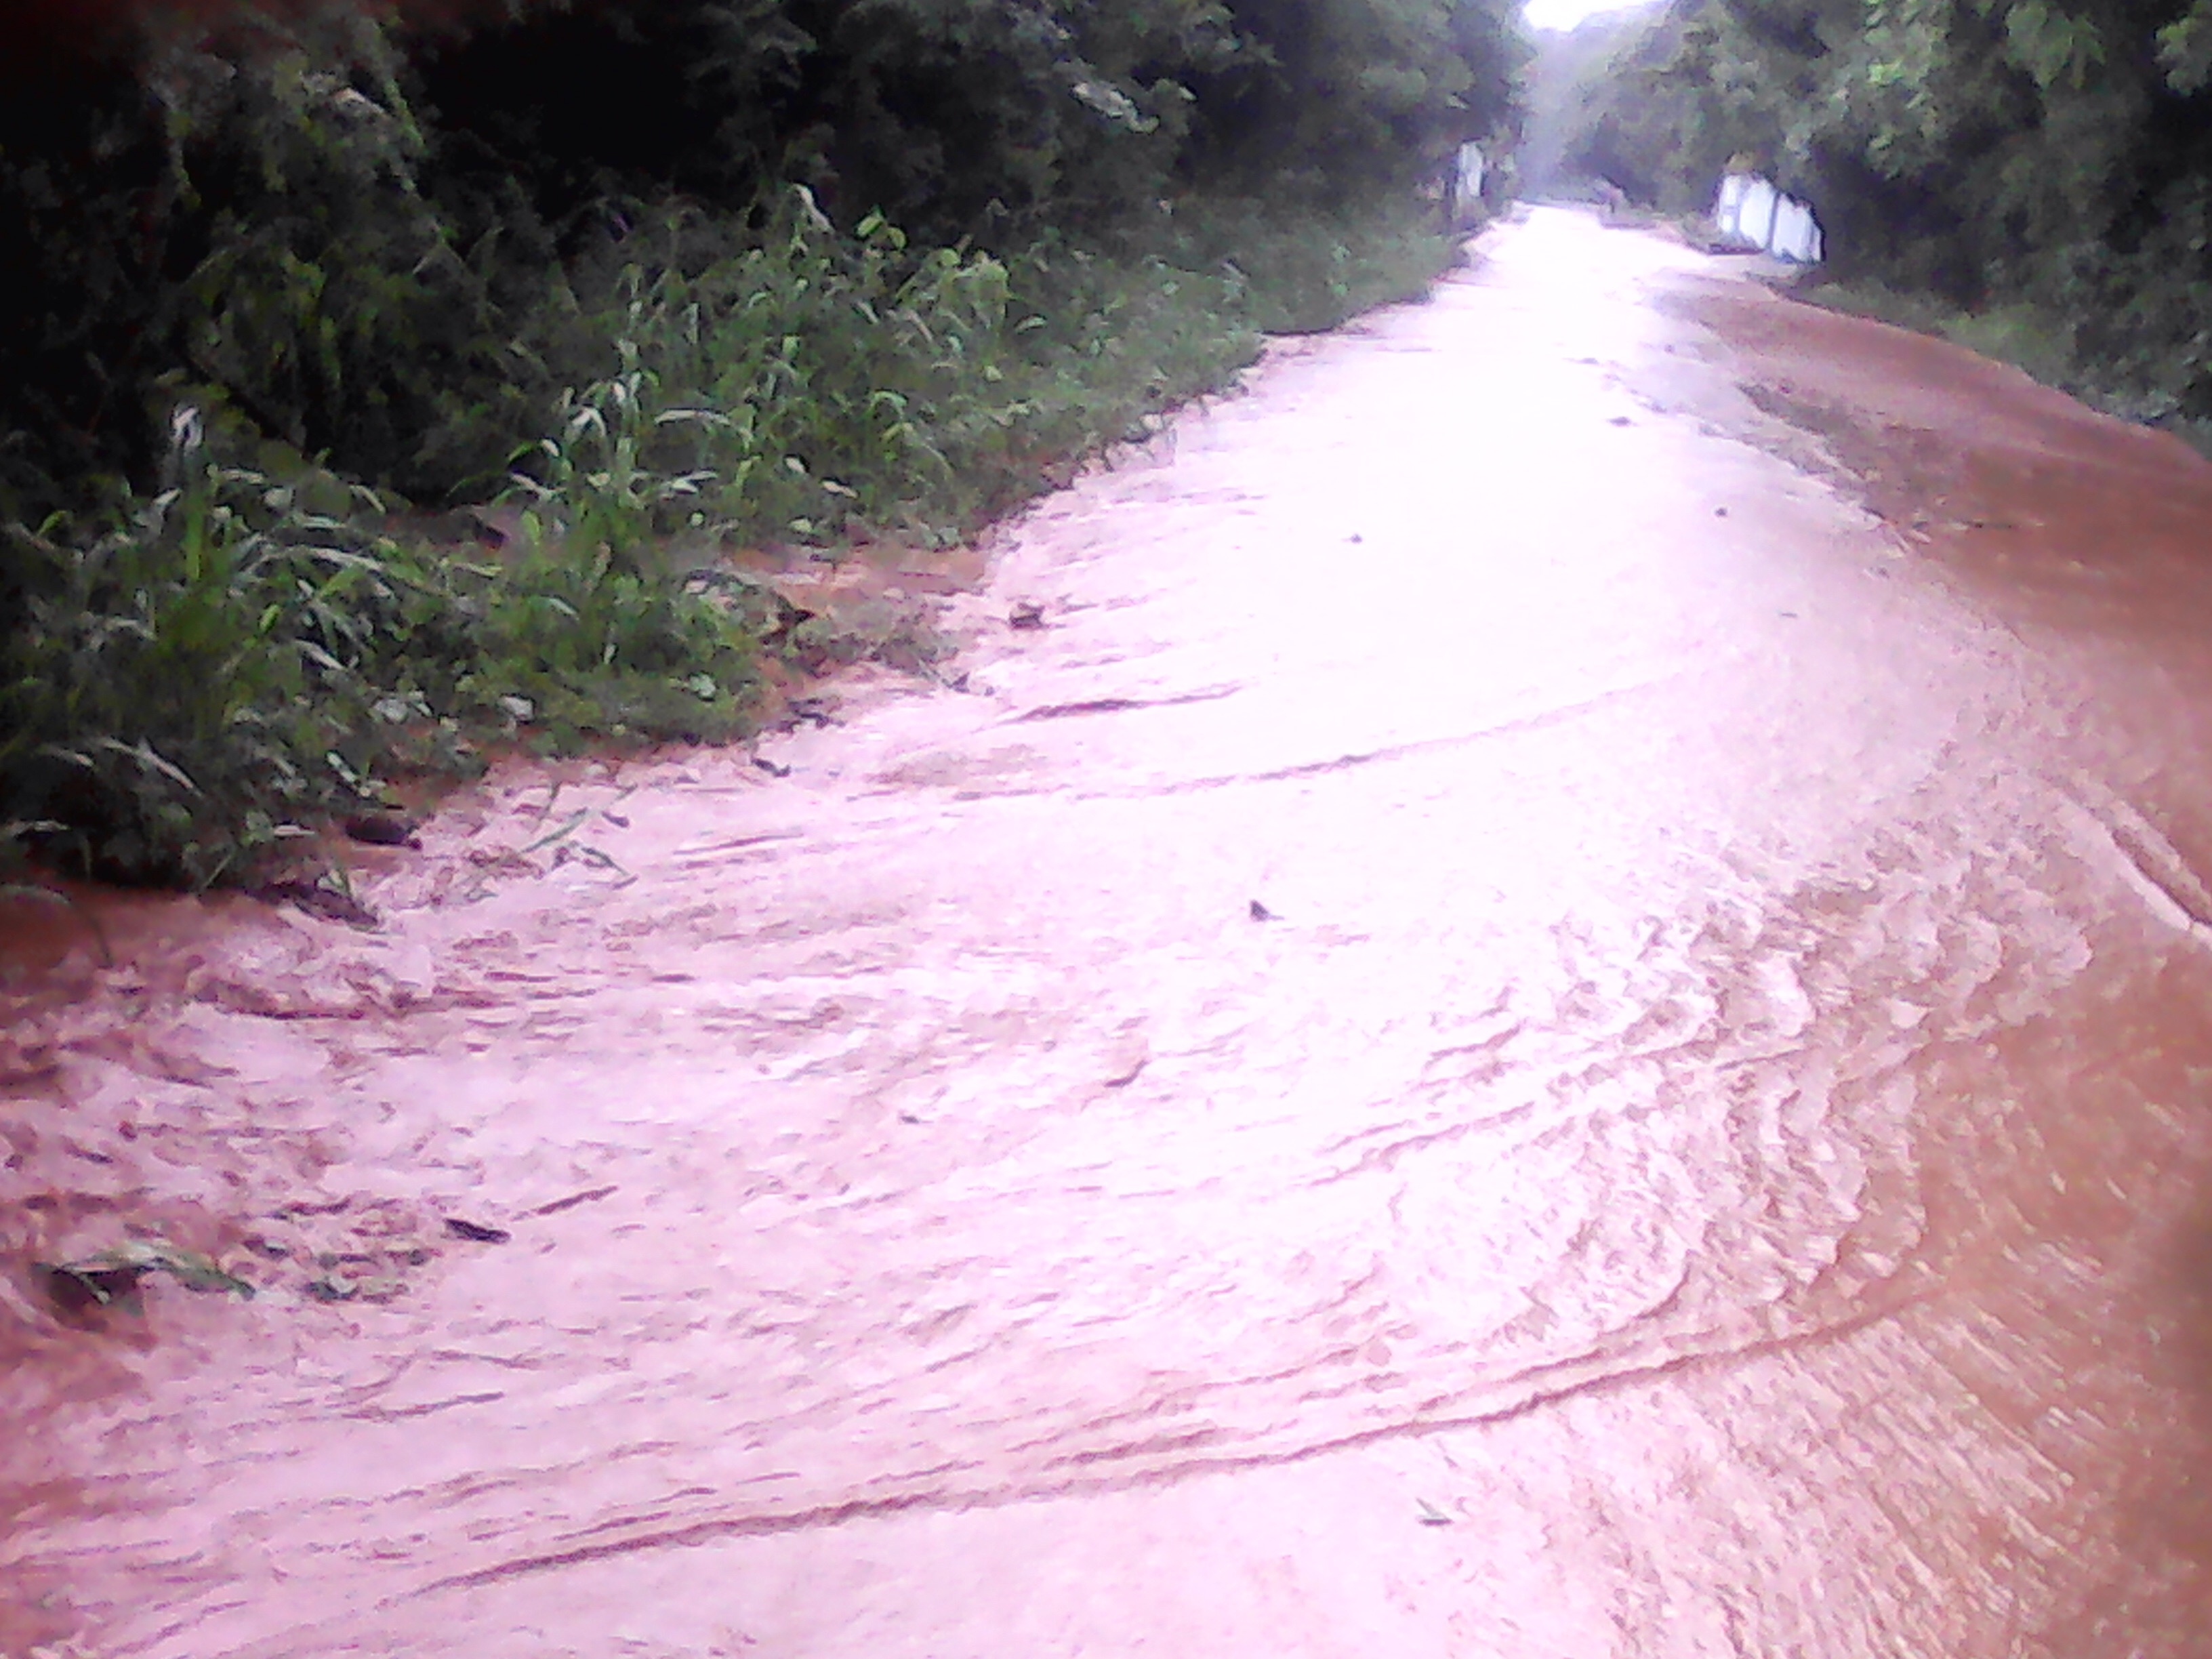 rain_on_the_street.JPG